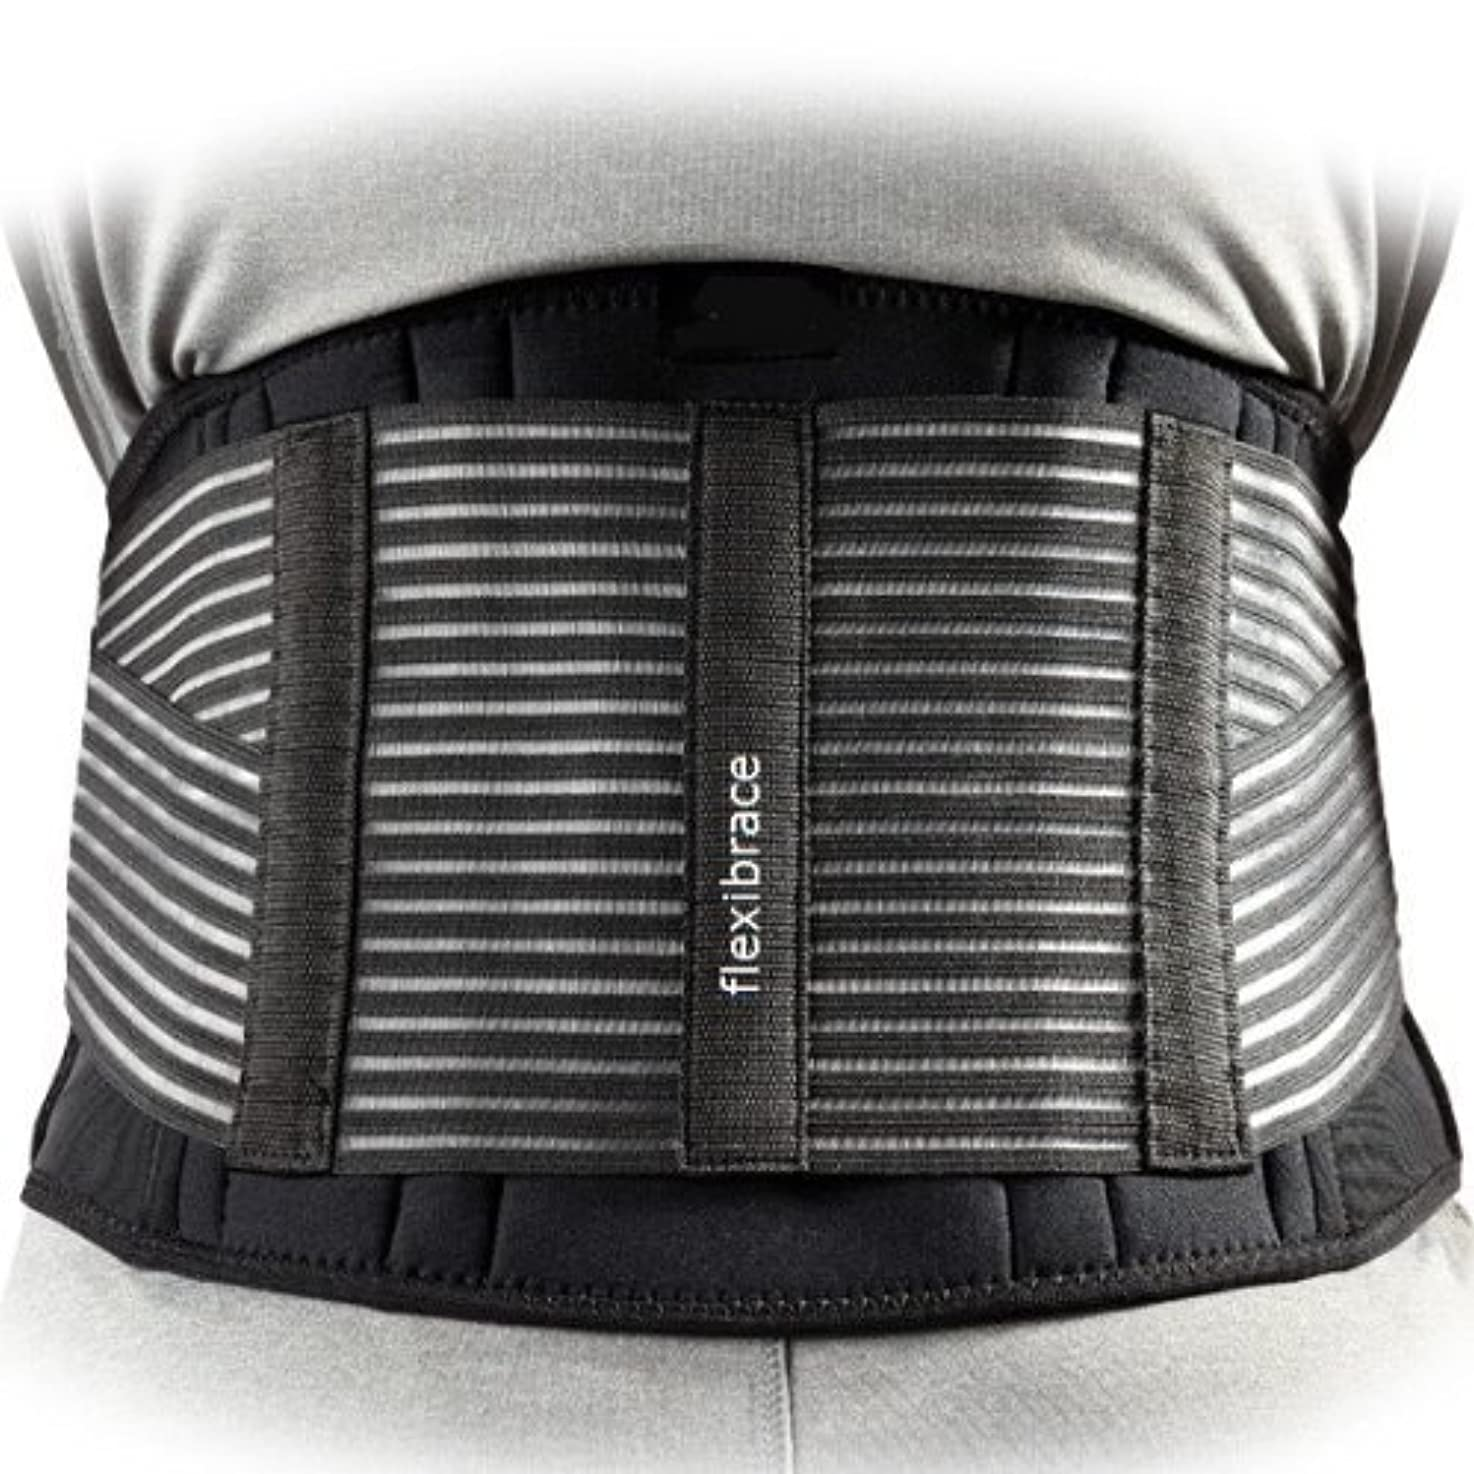 Flexibrace社 アメリカで一番売れている 骨盤ベルト コルセット (腰痛ケア)海外直送品?並行輸入品 (XLサイズ ウエスト105cm から 127cm)